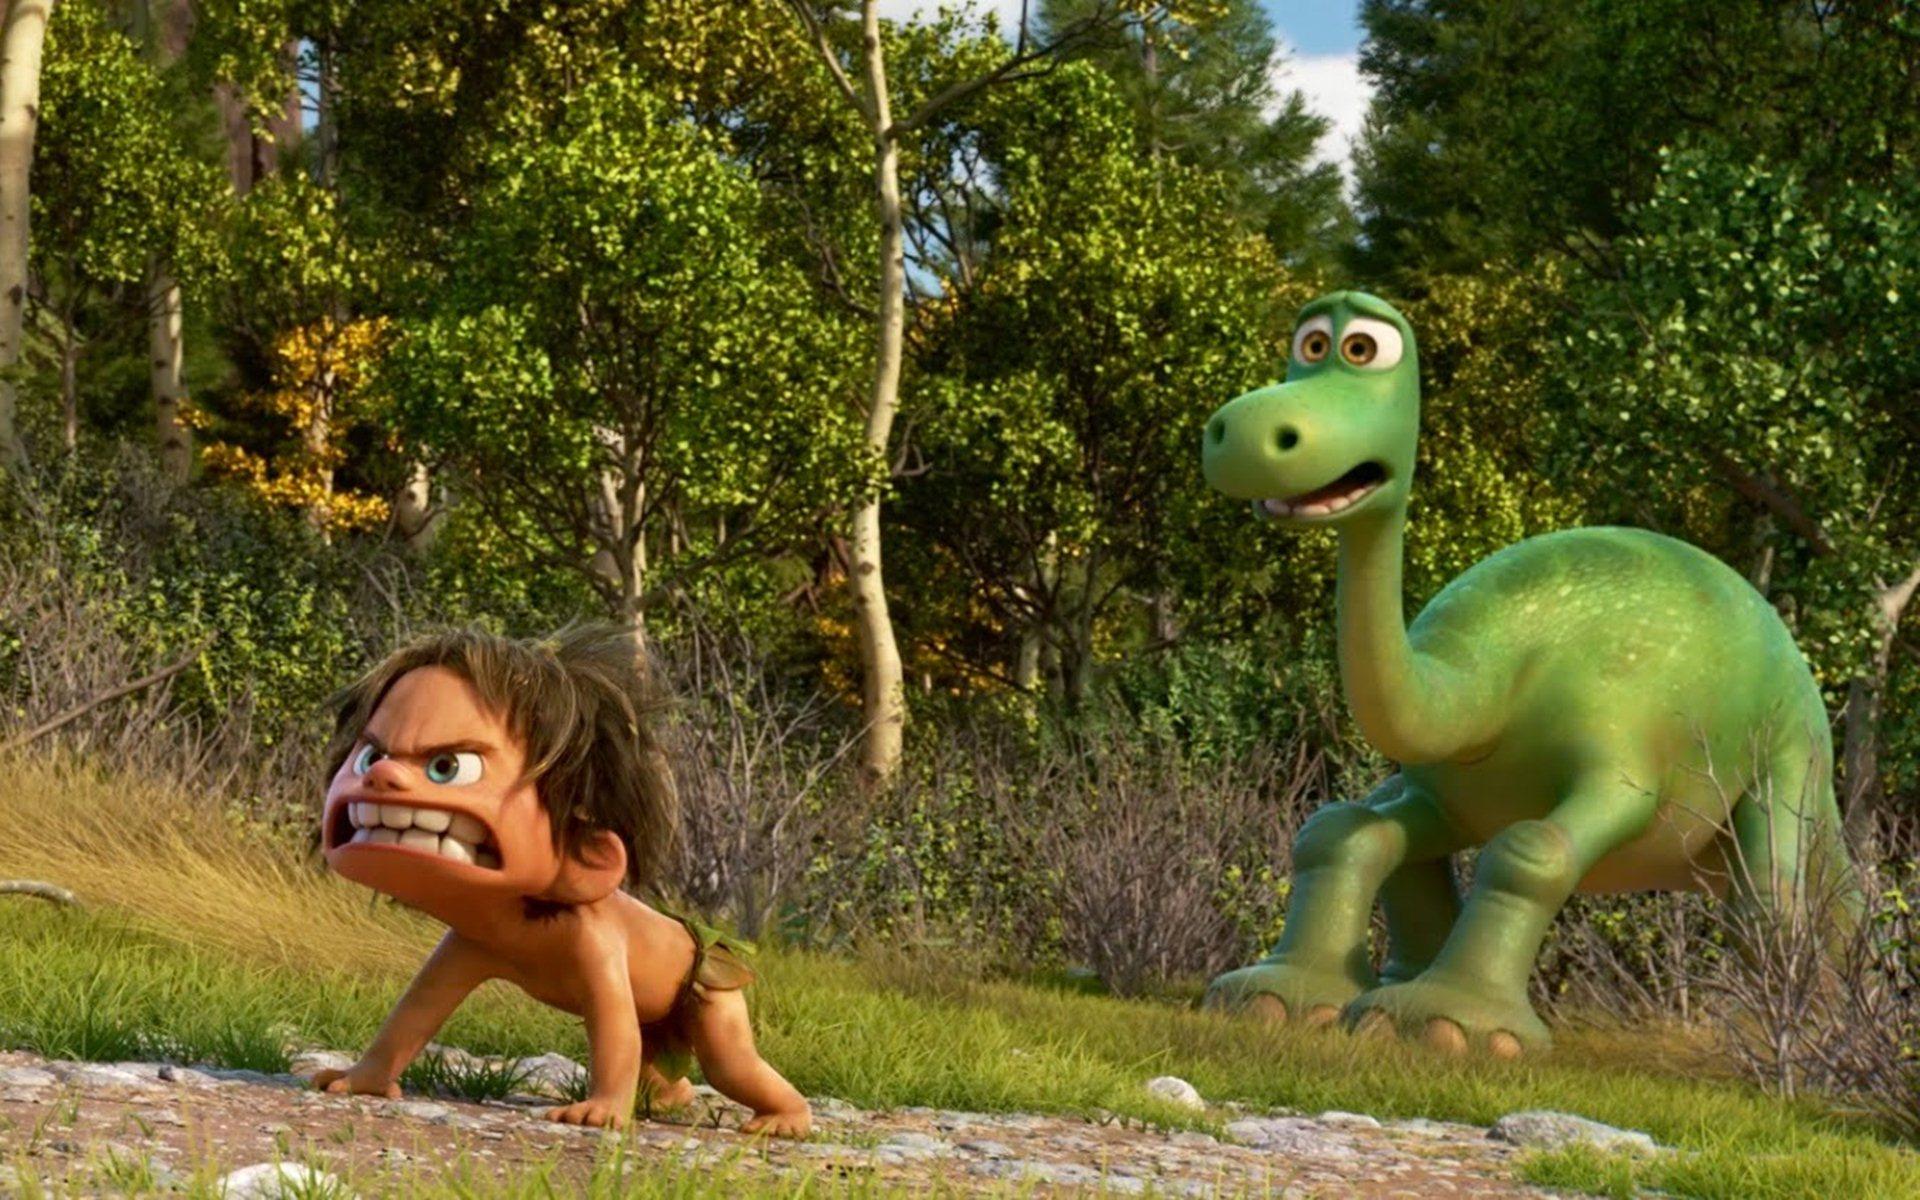 Spot the Cro-Magnon boy (voiced by Jack Bright) and Arlo the dinosaur (voiced by Raymond Ochoa) in The Good Dinosaur (2015)